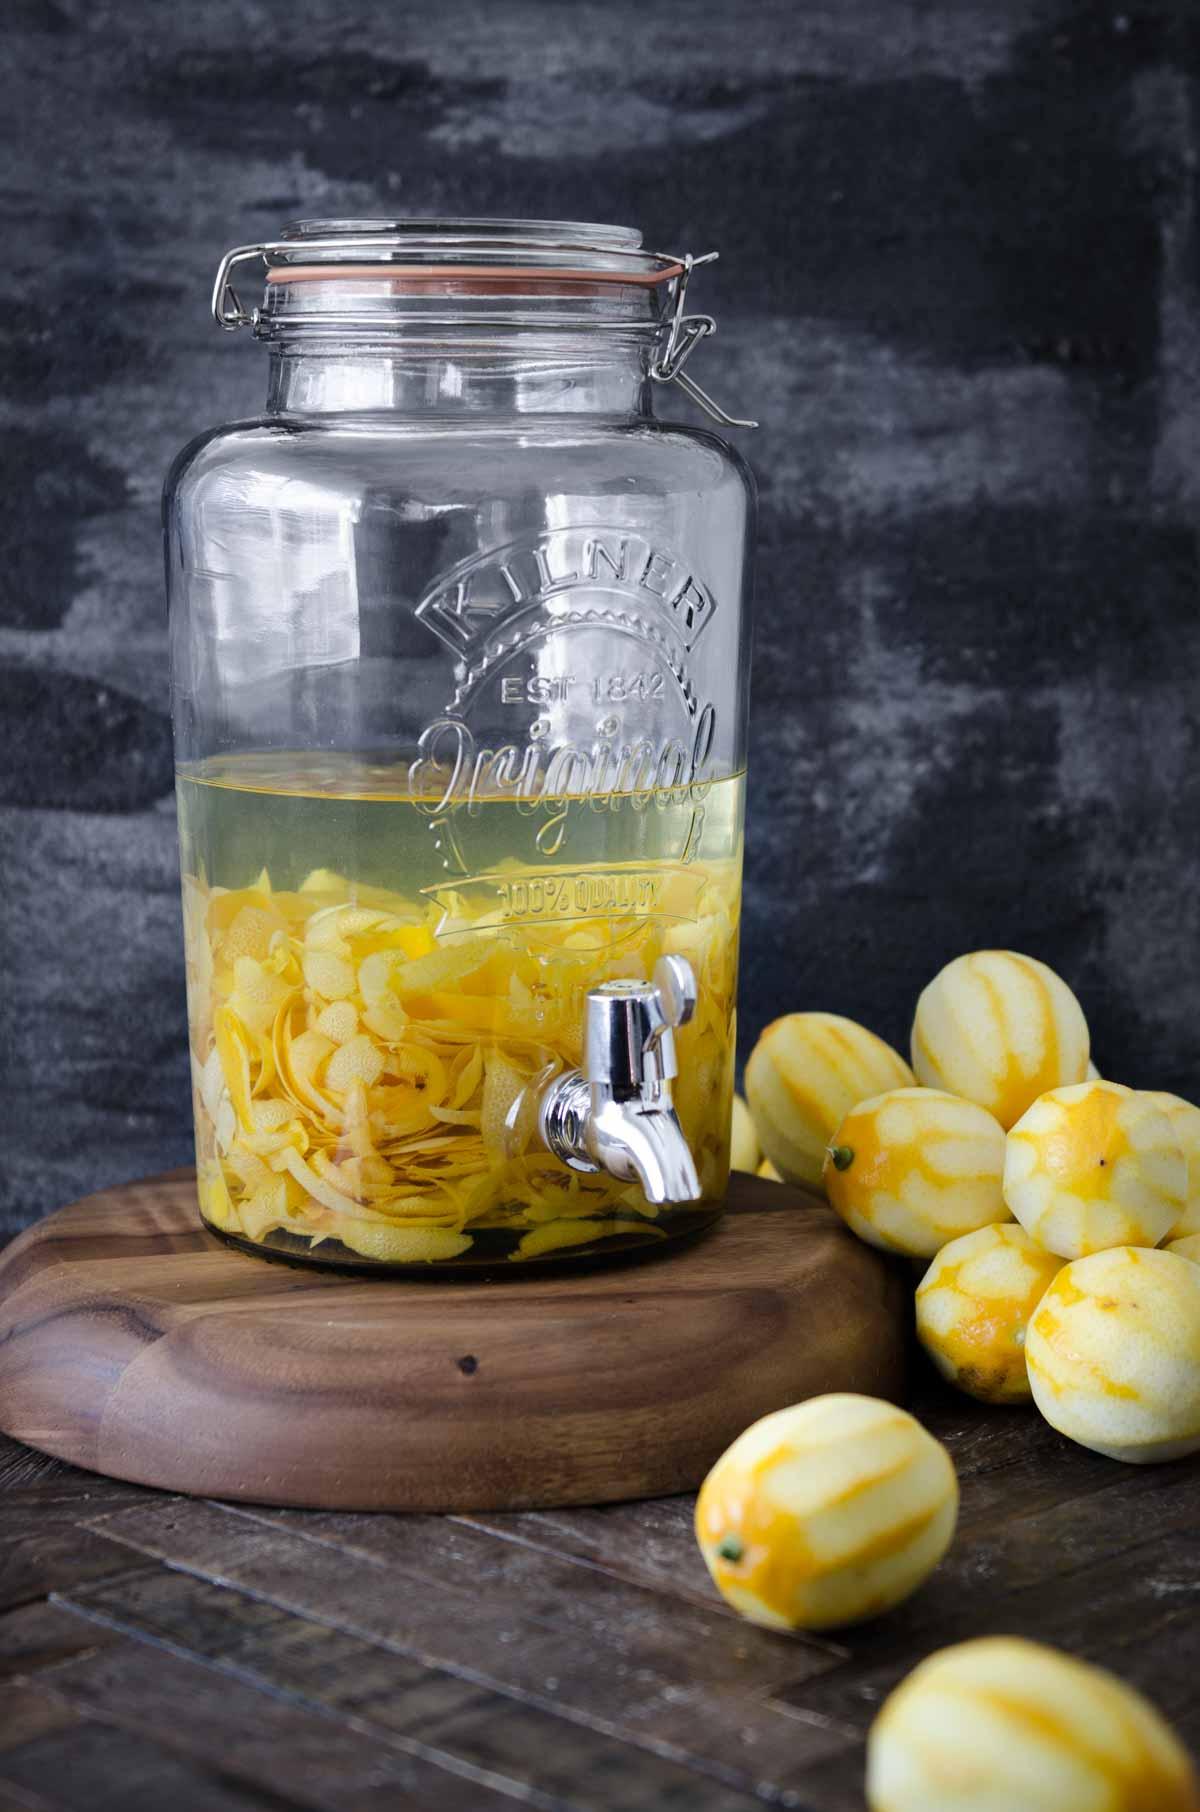 Homemade Limoncello | Chew Town Food Blog